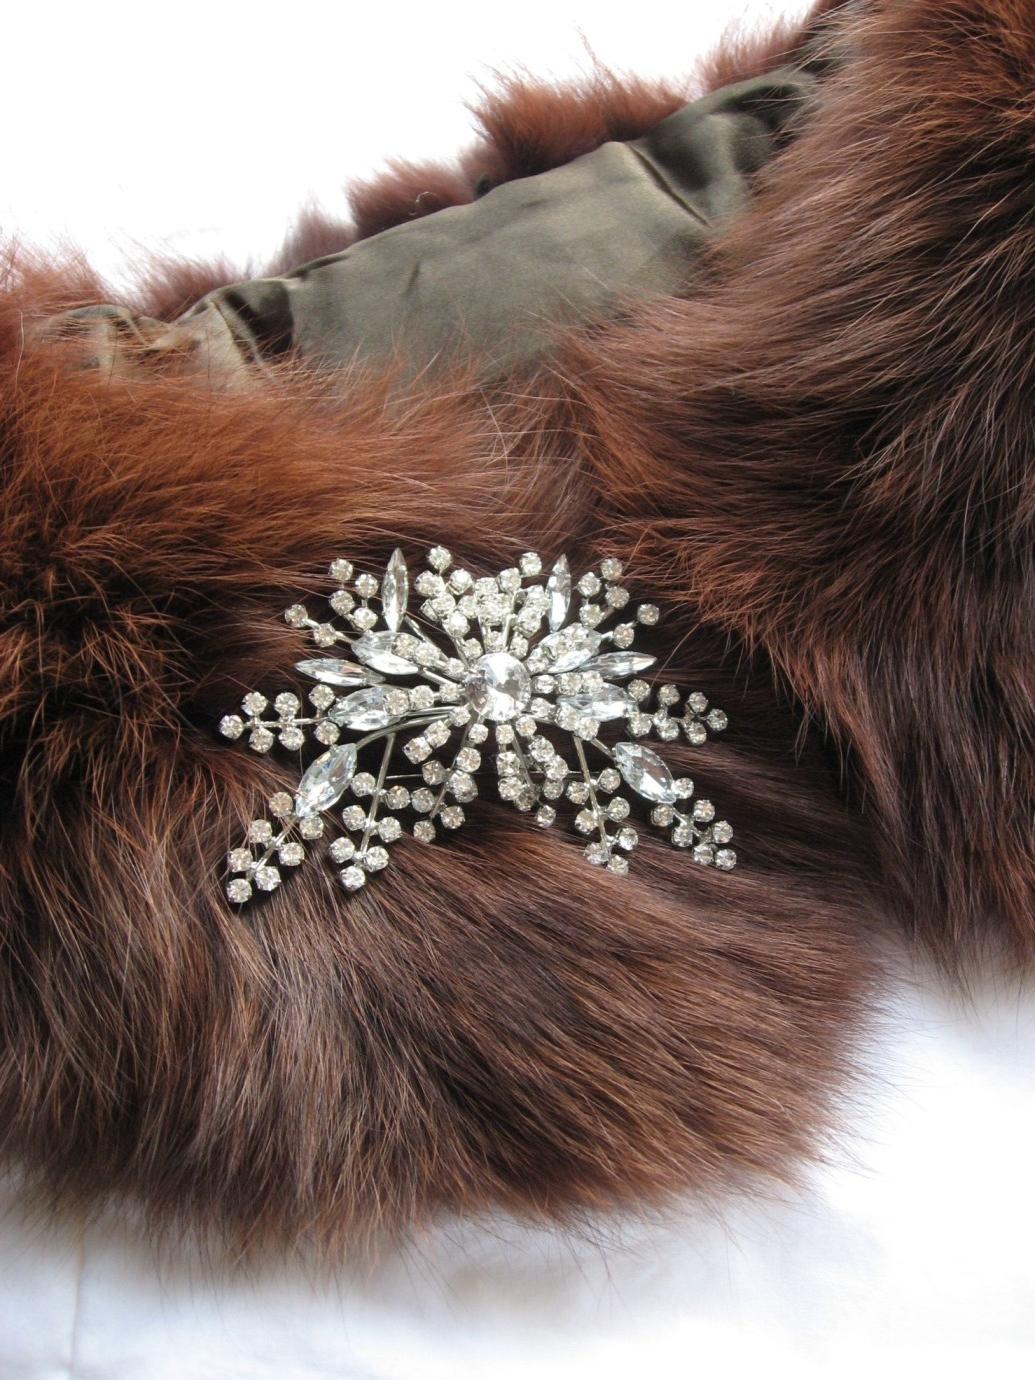 Super large wedding sparkle rhinestones - sparkle rhinestone for wedding